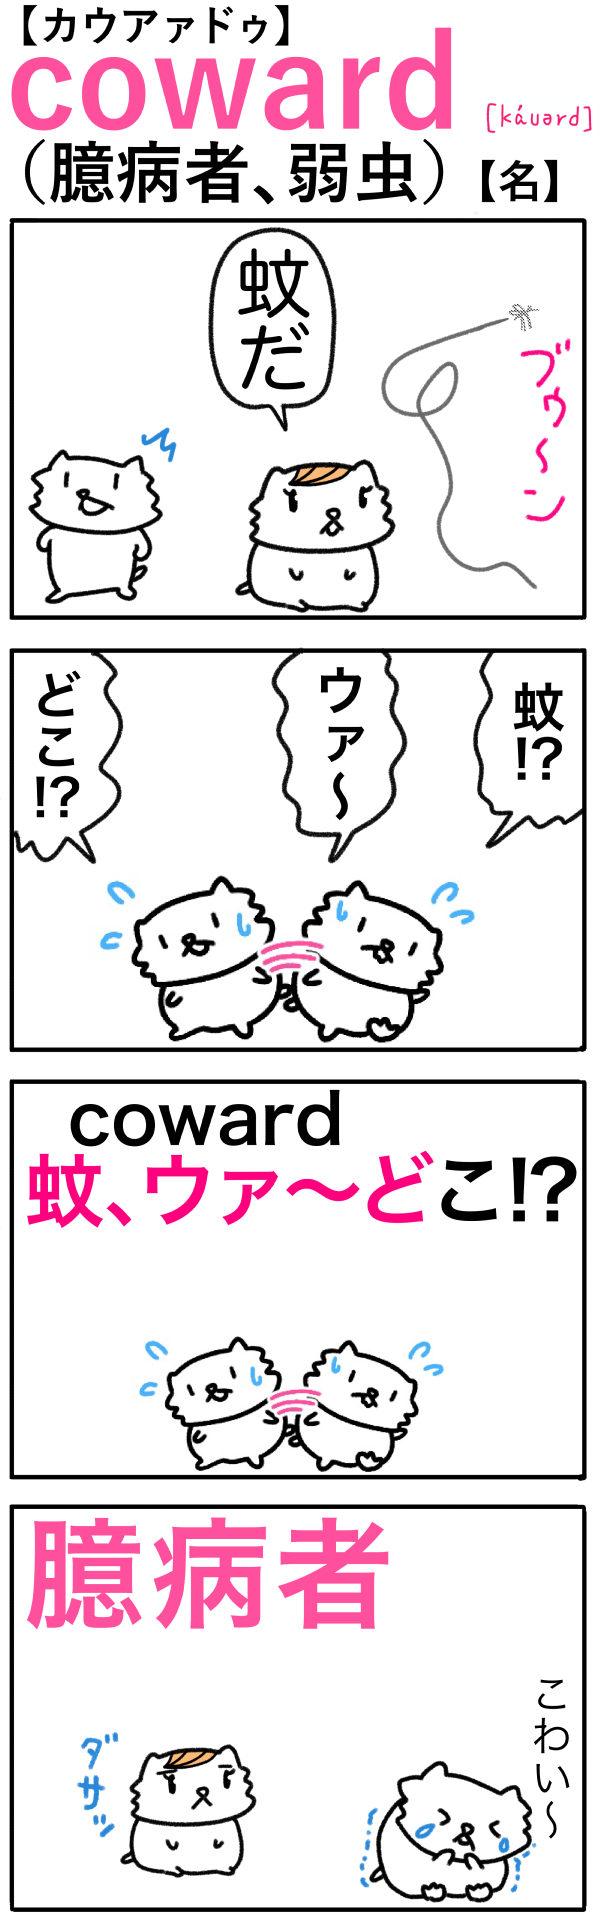 coward(臆病者)の語呂合わせ英単語